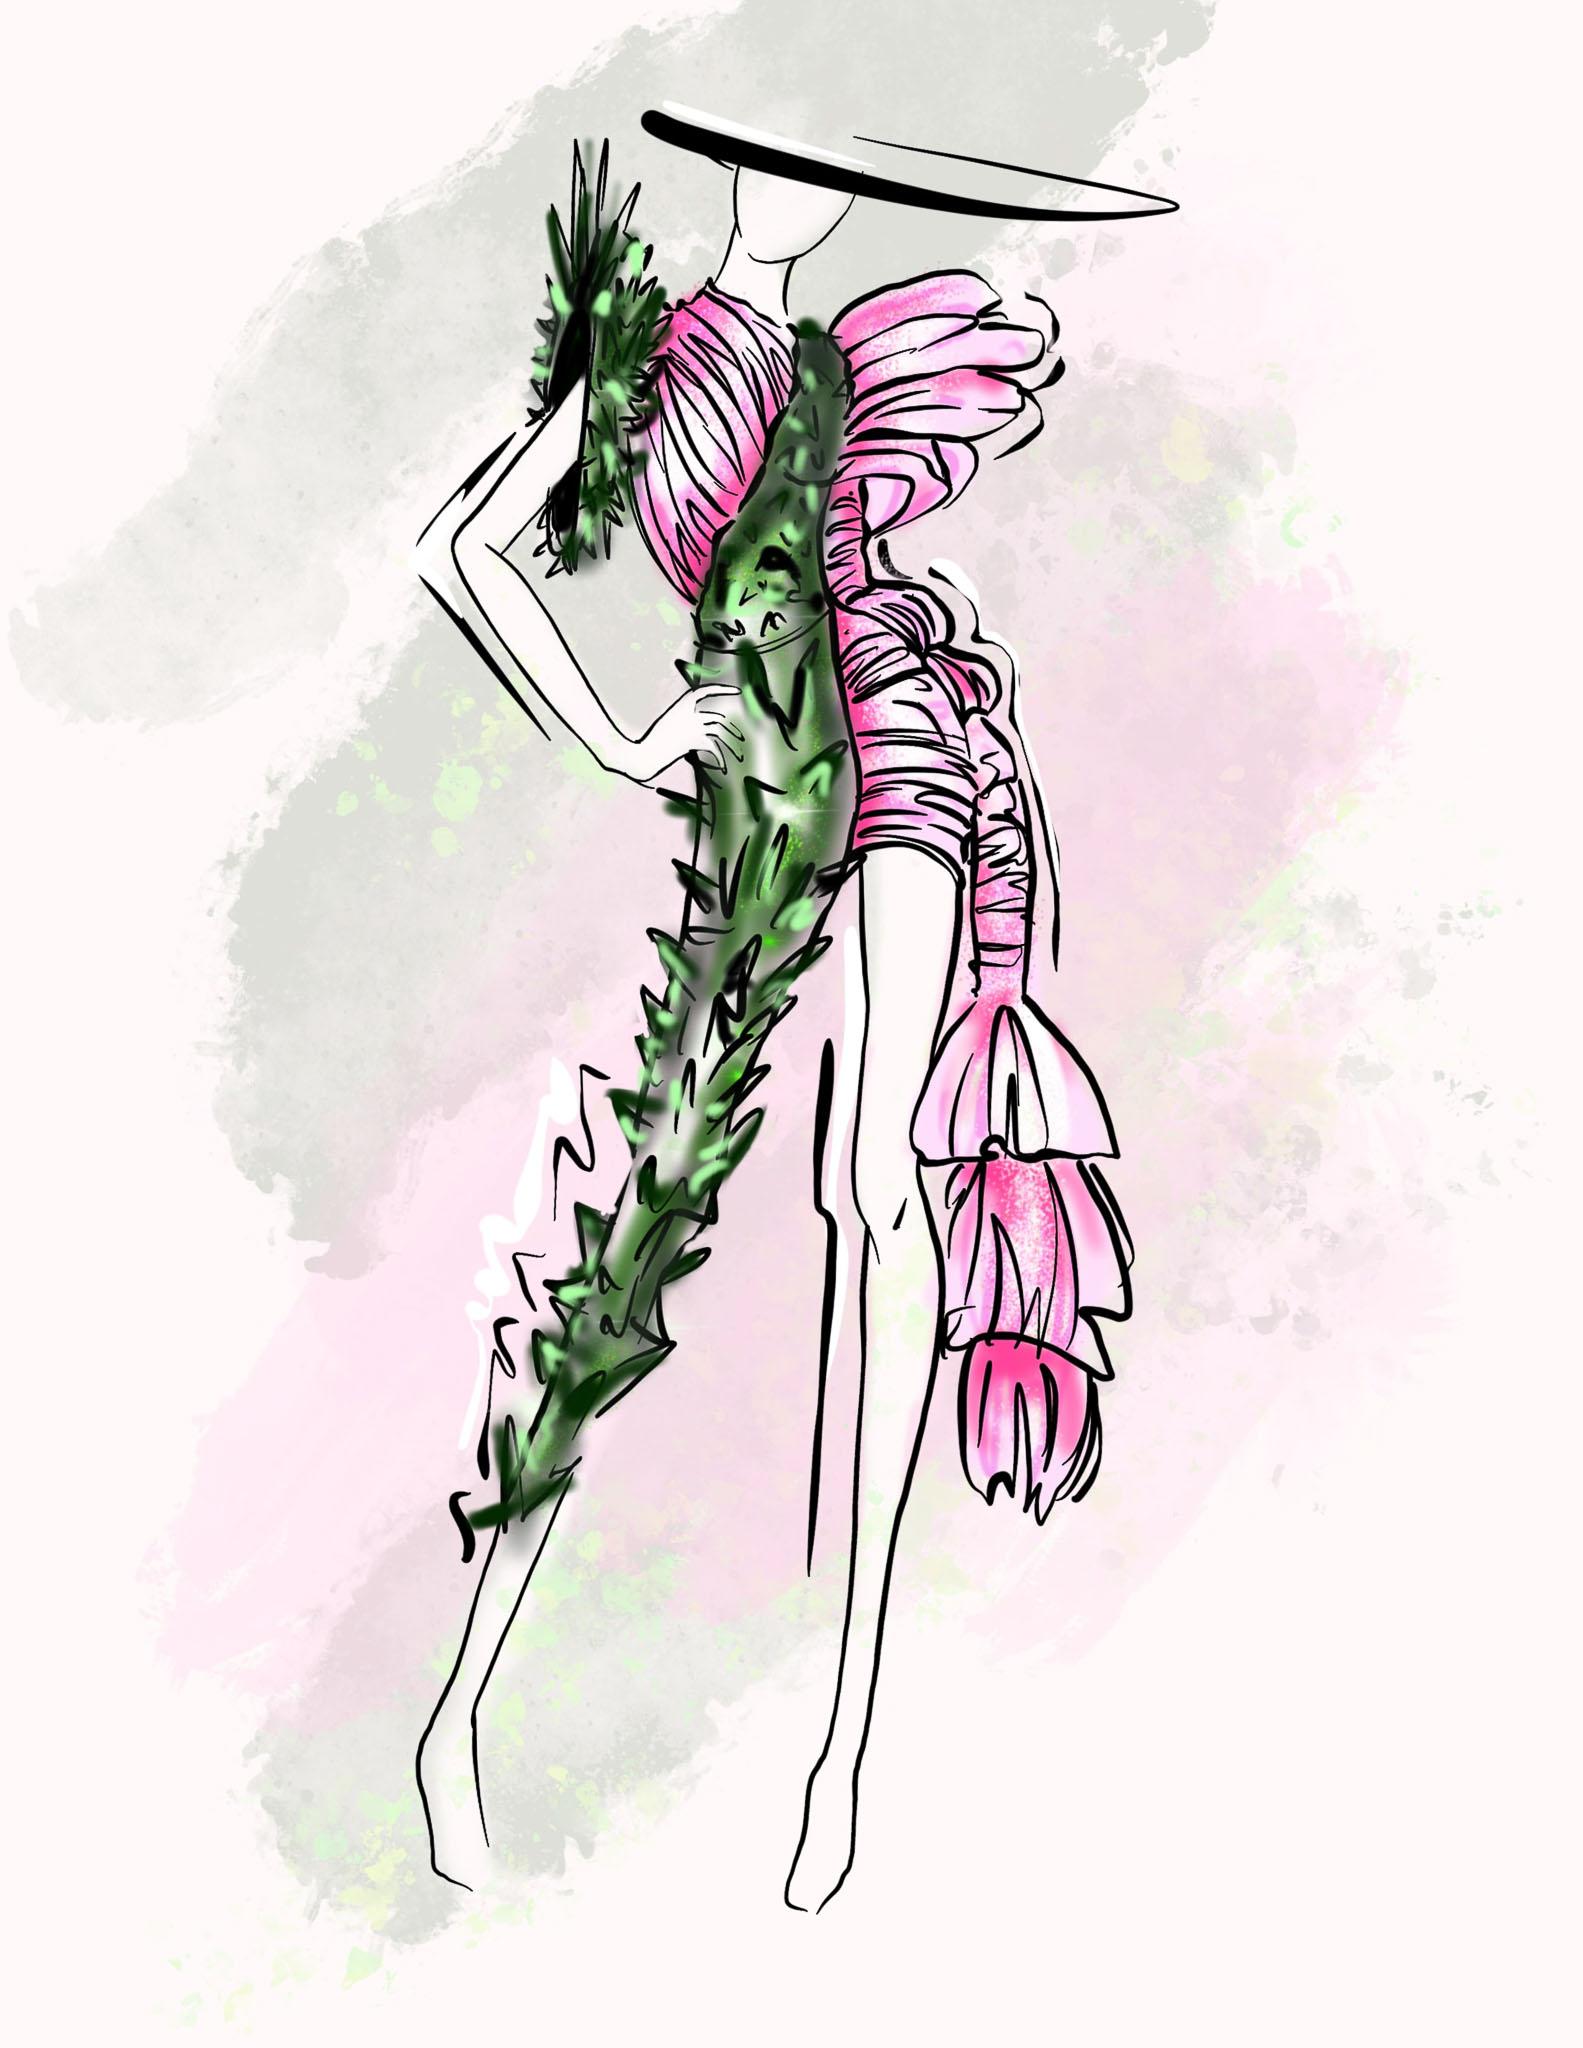 Cactus: Sophya Kravtsova, Ukraine, Newcomer, Tailors School (Create your Revolution)